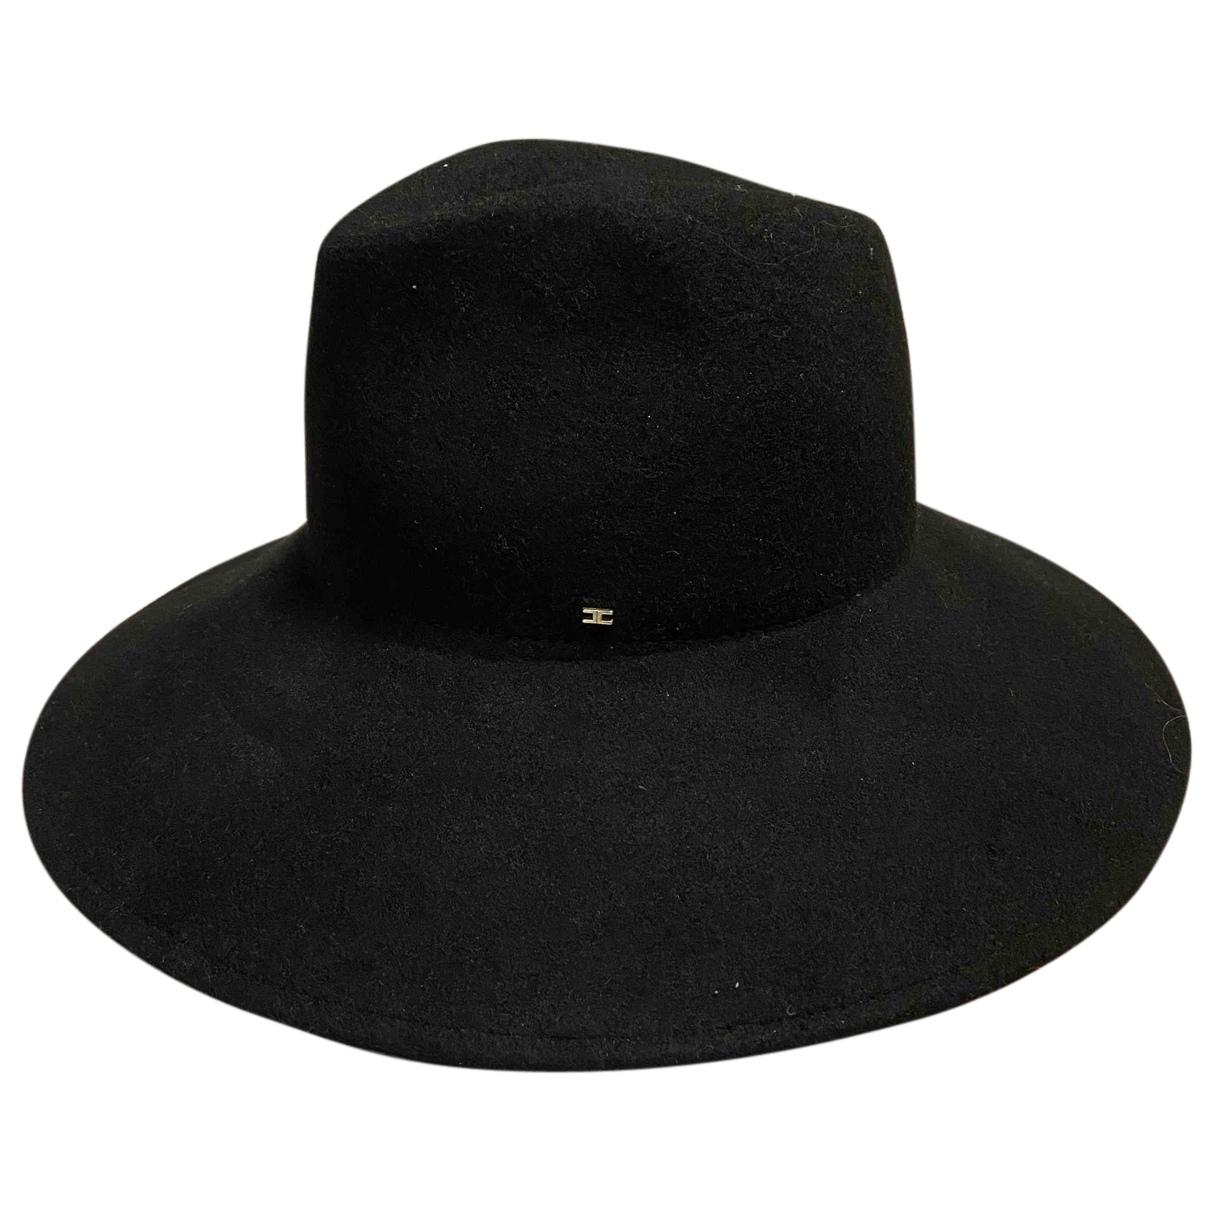 Elisabetta Franchi N Black Wool hat for Women 55 cm